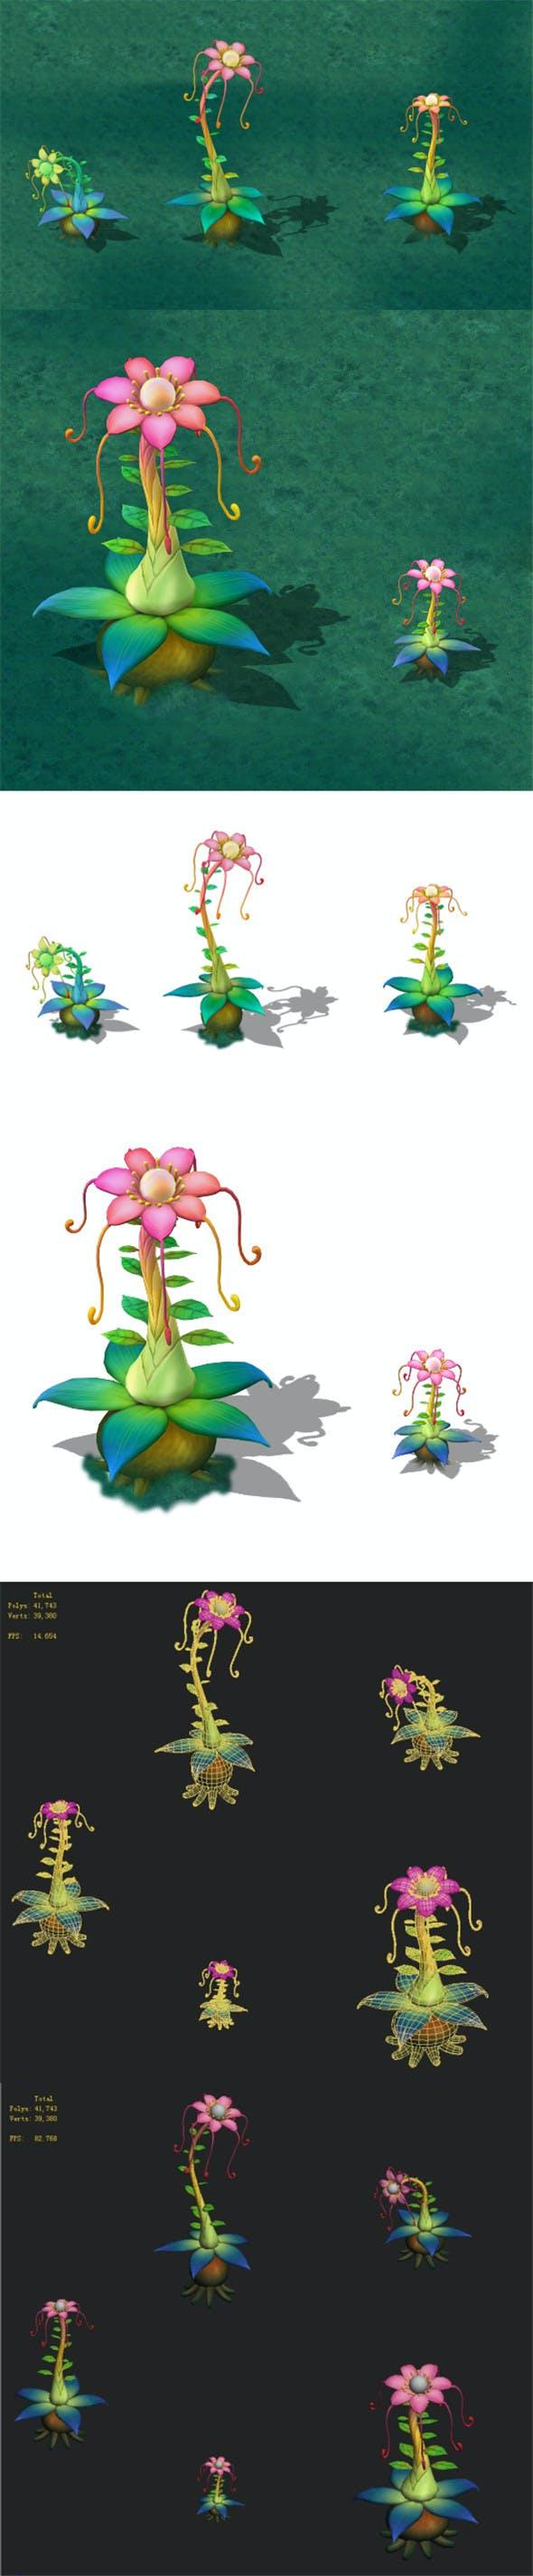 Cartoon version - Prophet magic flower - 3DOcean Item for Sale